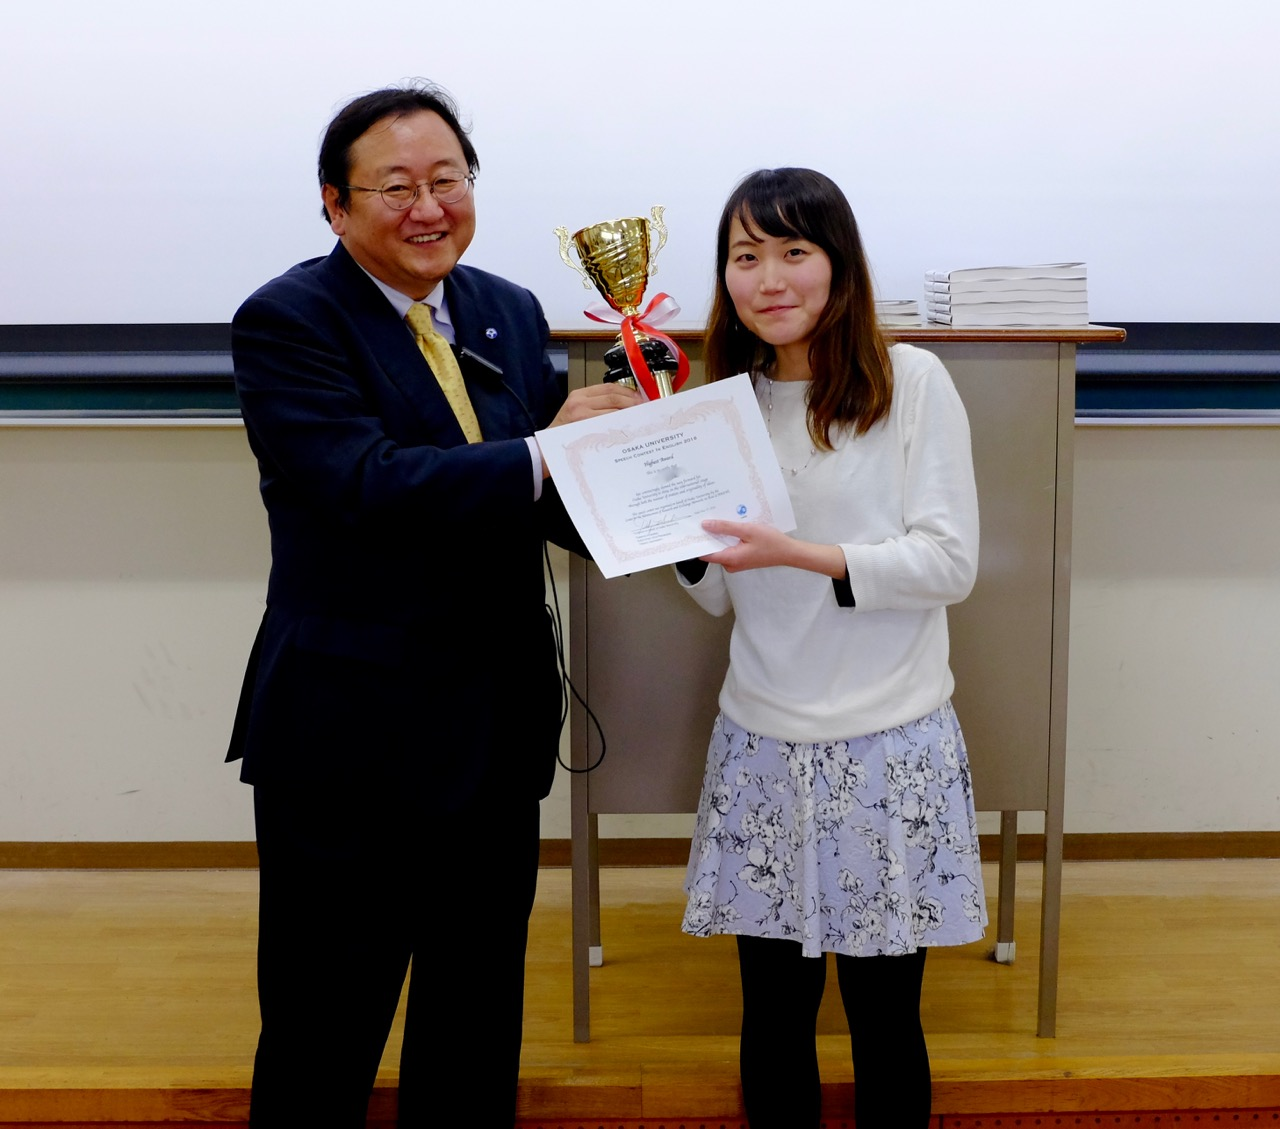 Miss Nana Chishima, being presented with the Highest Award by Professor Hoshino, Osaka University's  Executive Vice President.